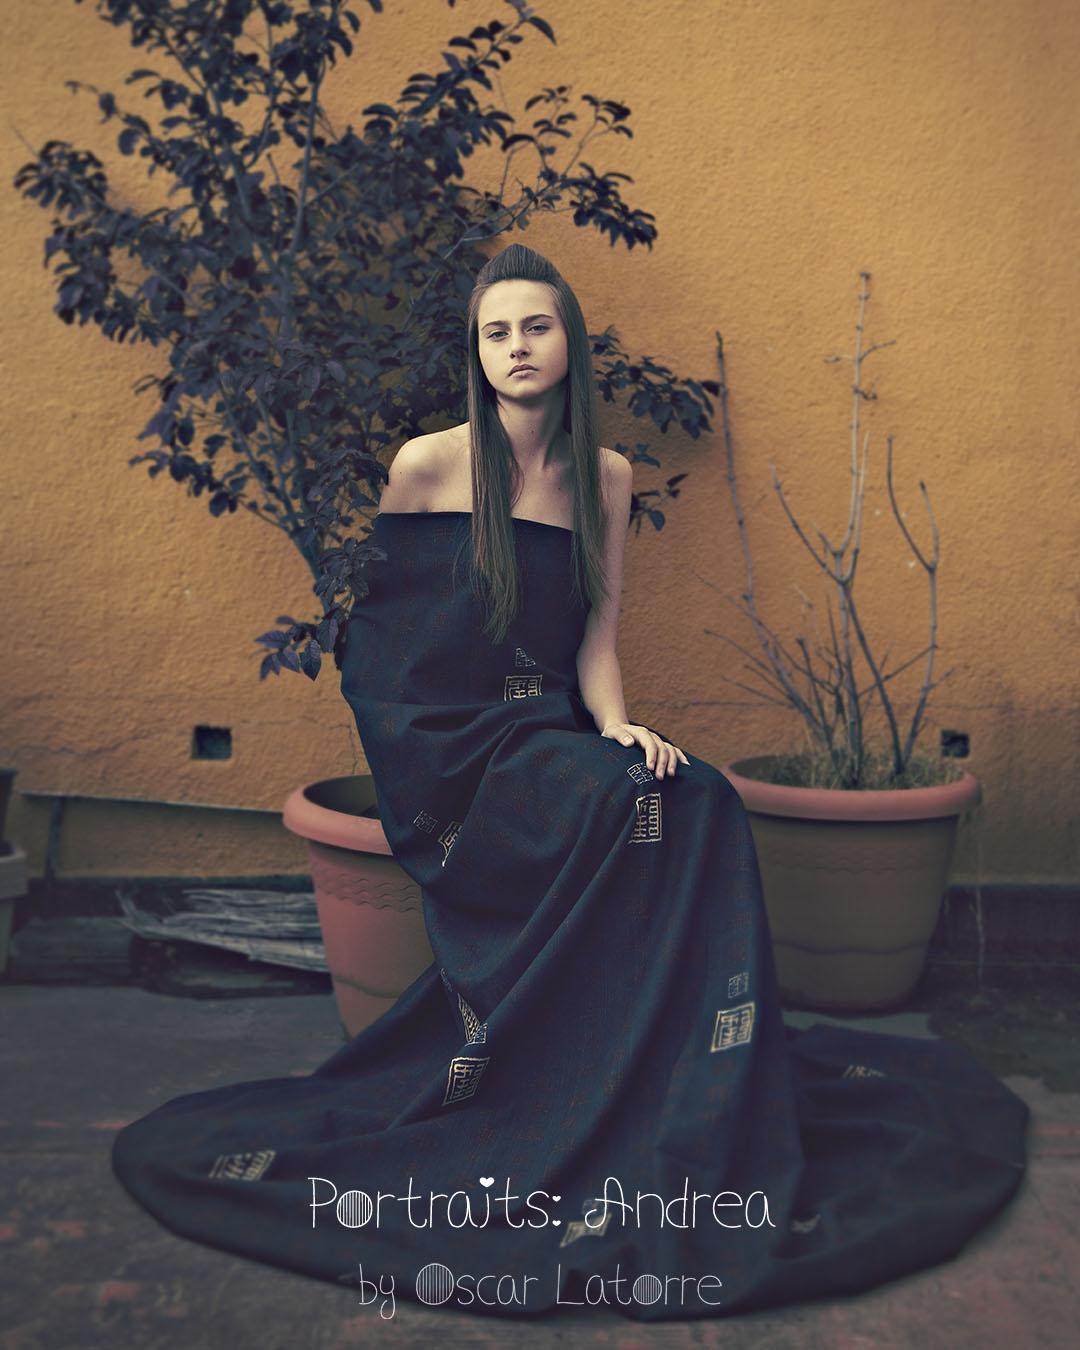 Andrea by Oscar Latorre